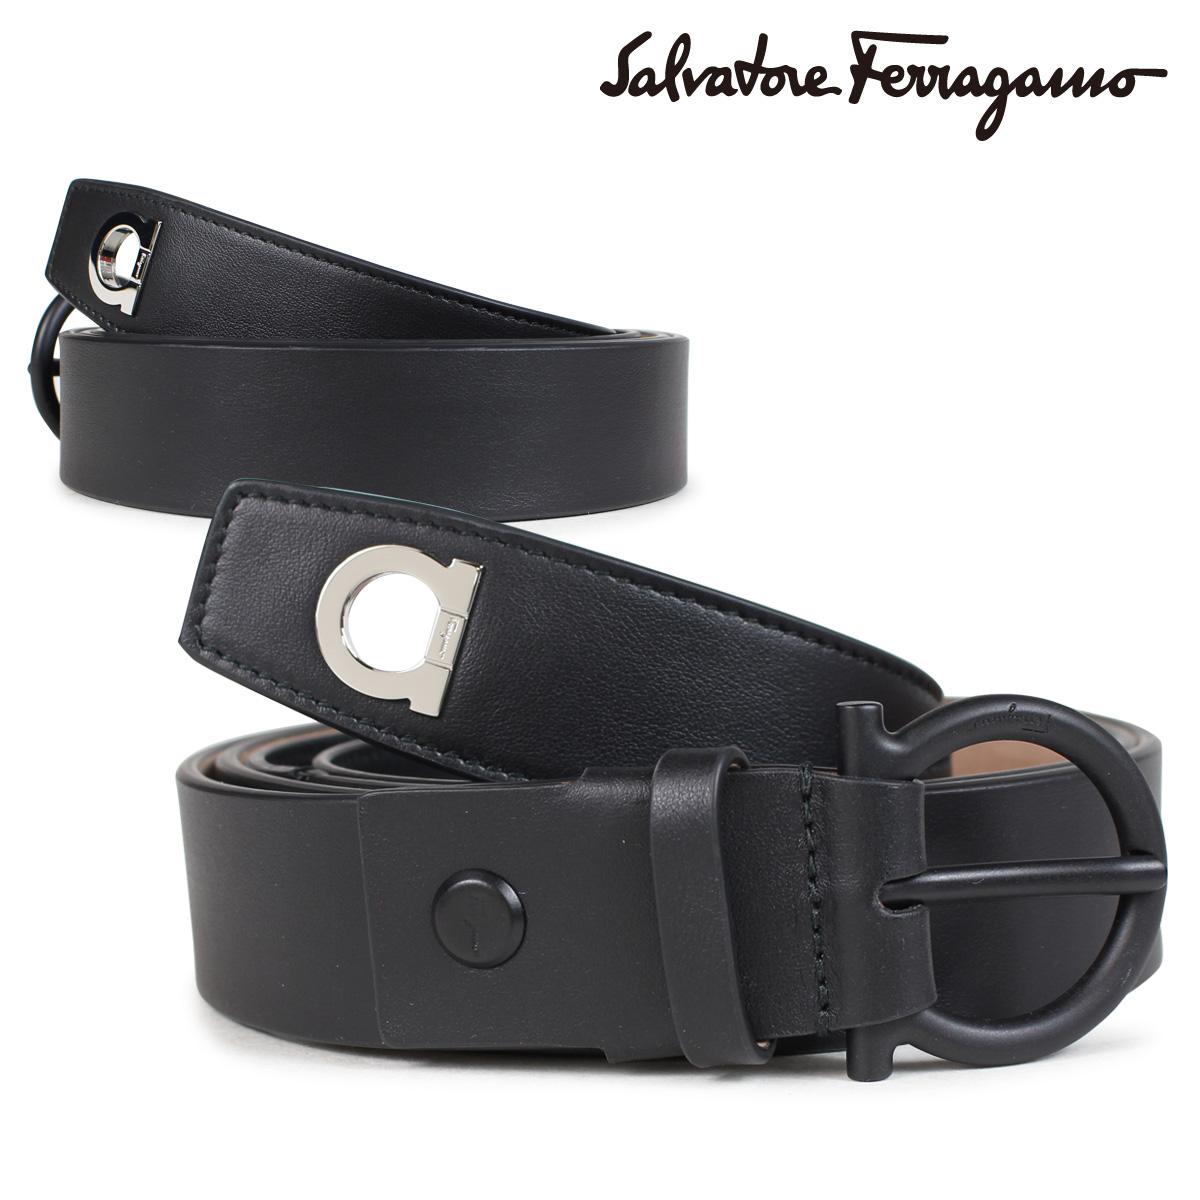 Salvatore Ferragamo ADJUSTABLE GANCINI BELT フェラガモ ベルト メンズ レザーベルト ブラック 679951